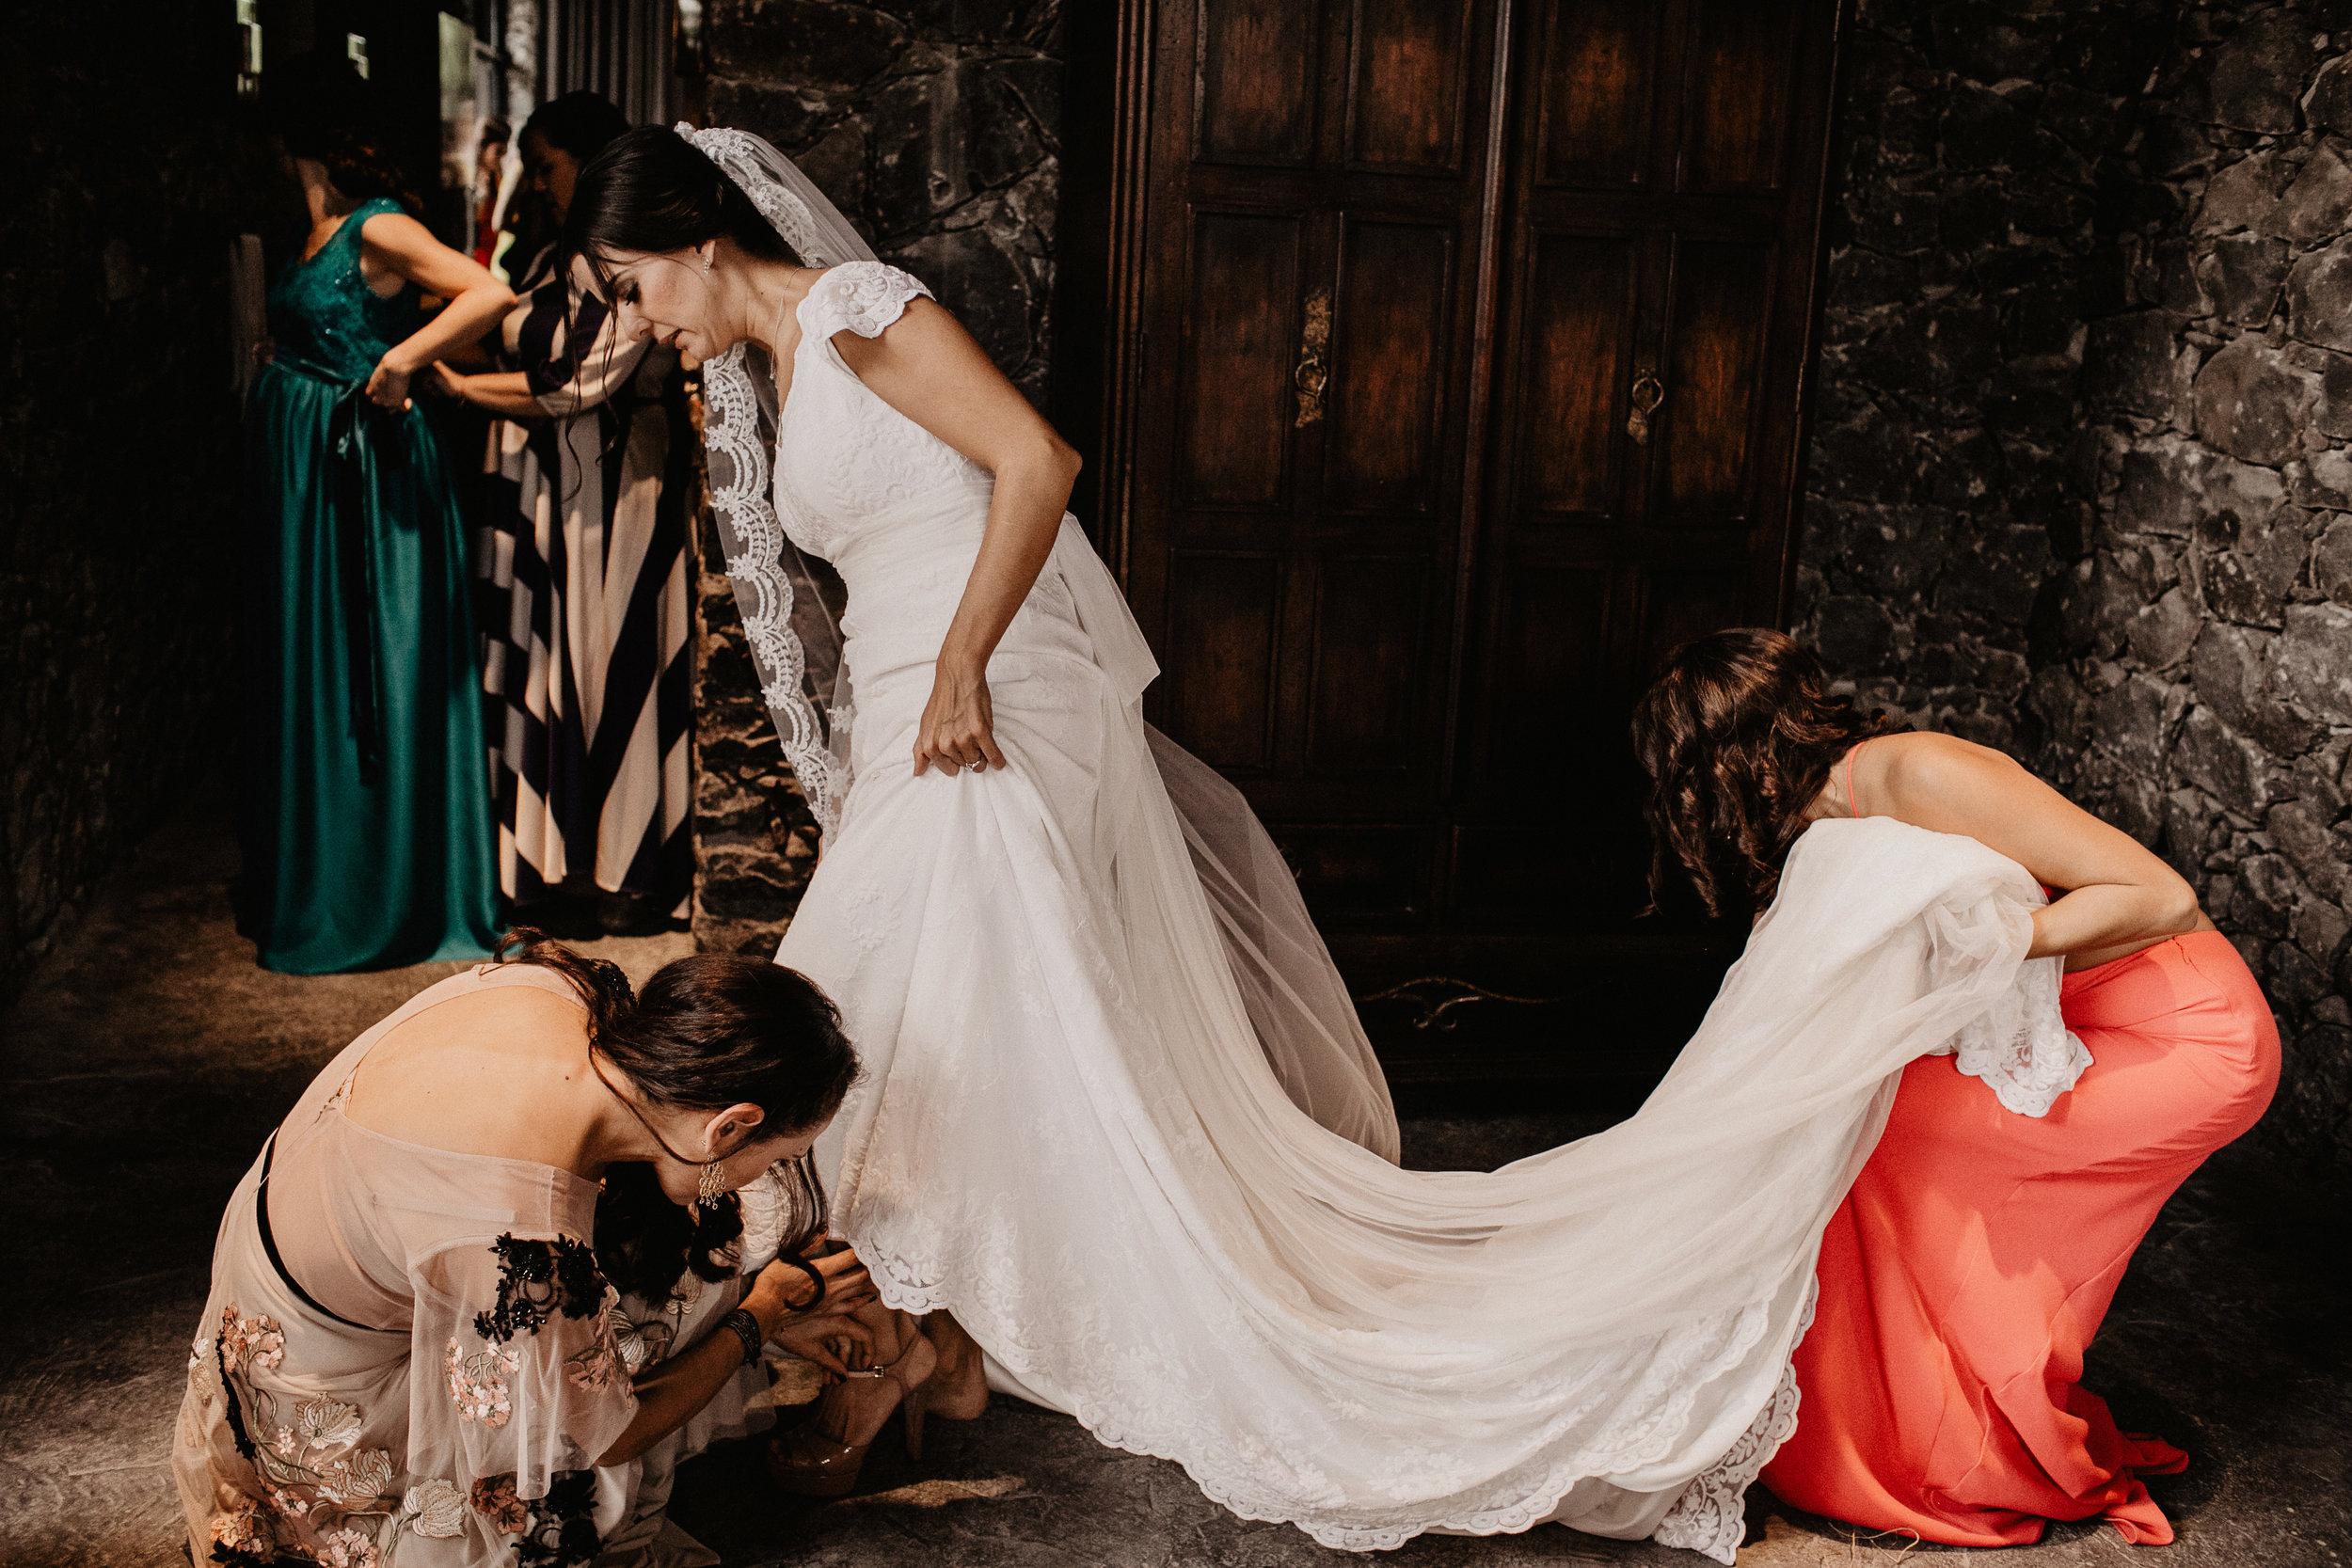 alfonso_flores_destination_wedding_photographer_pau_alonso_184.JPG